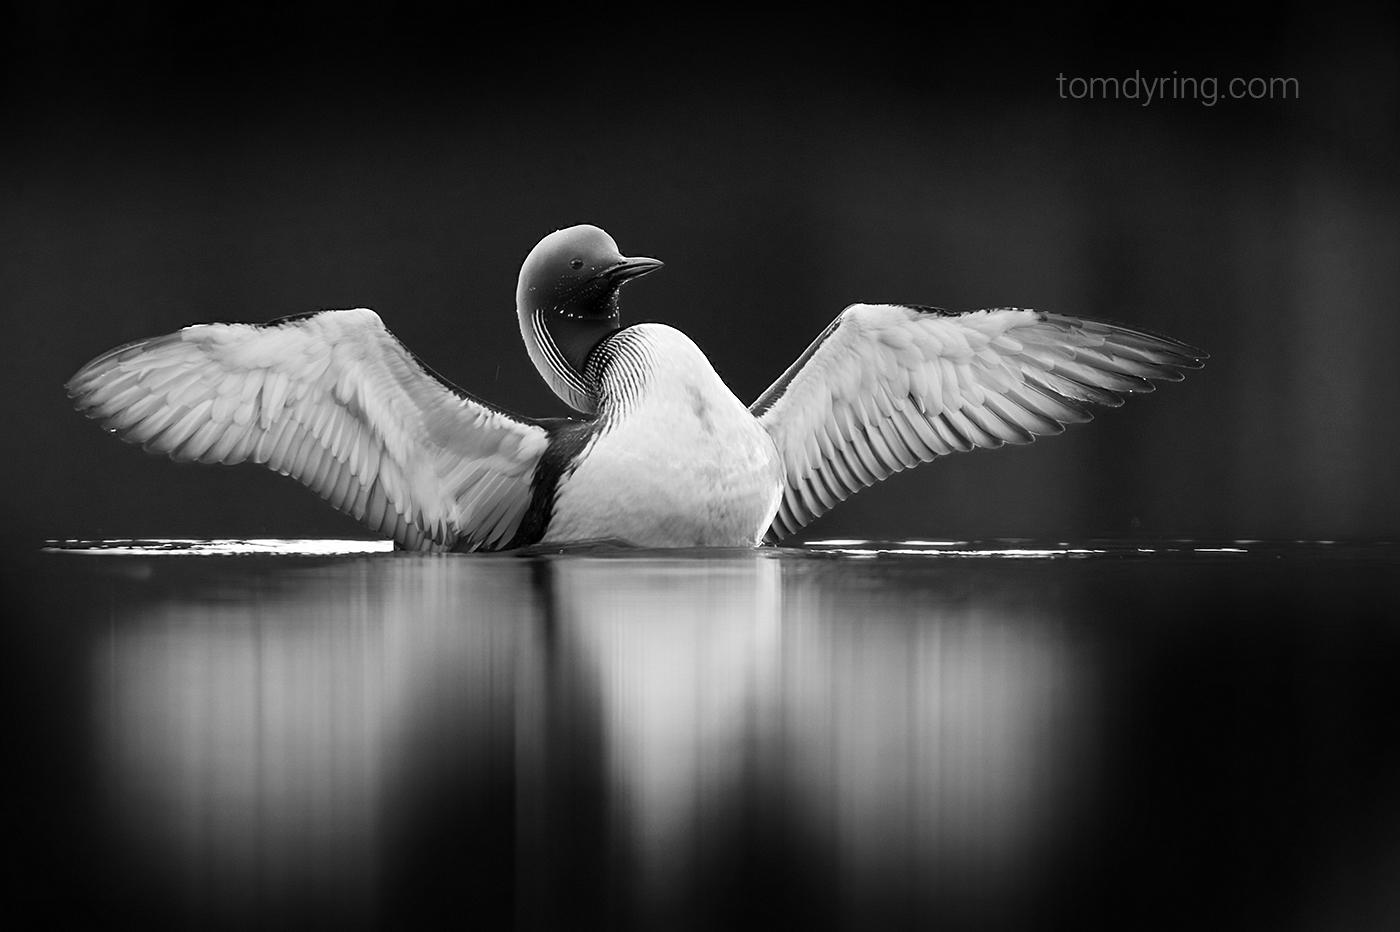 Foto: Tom Dyring